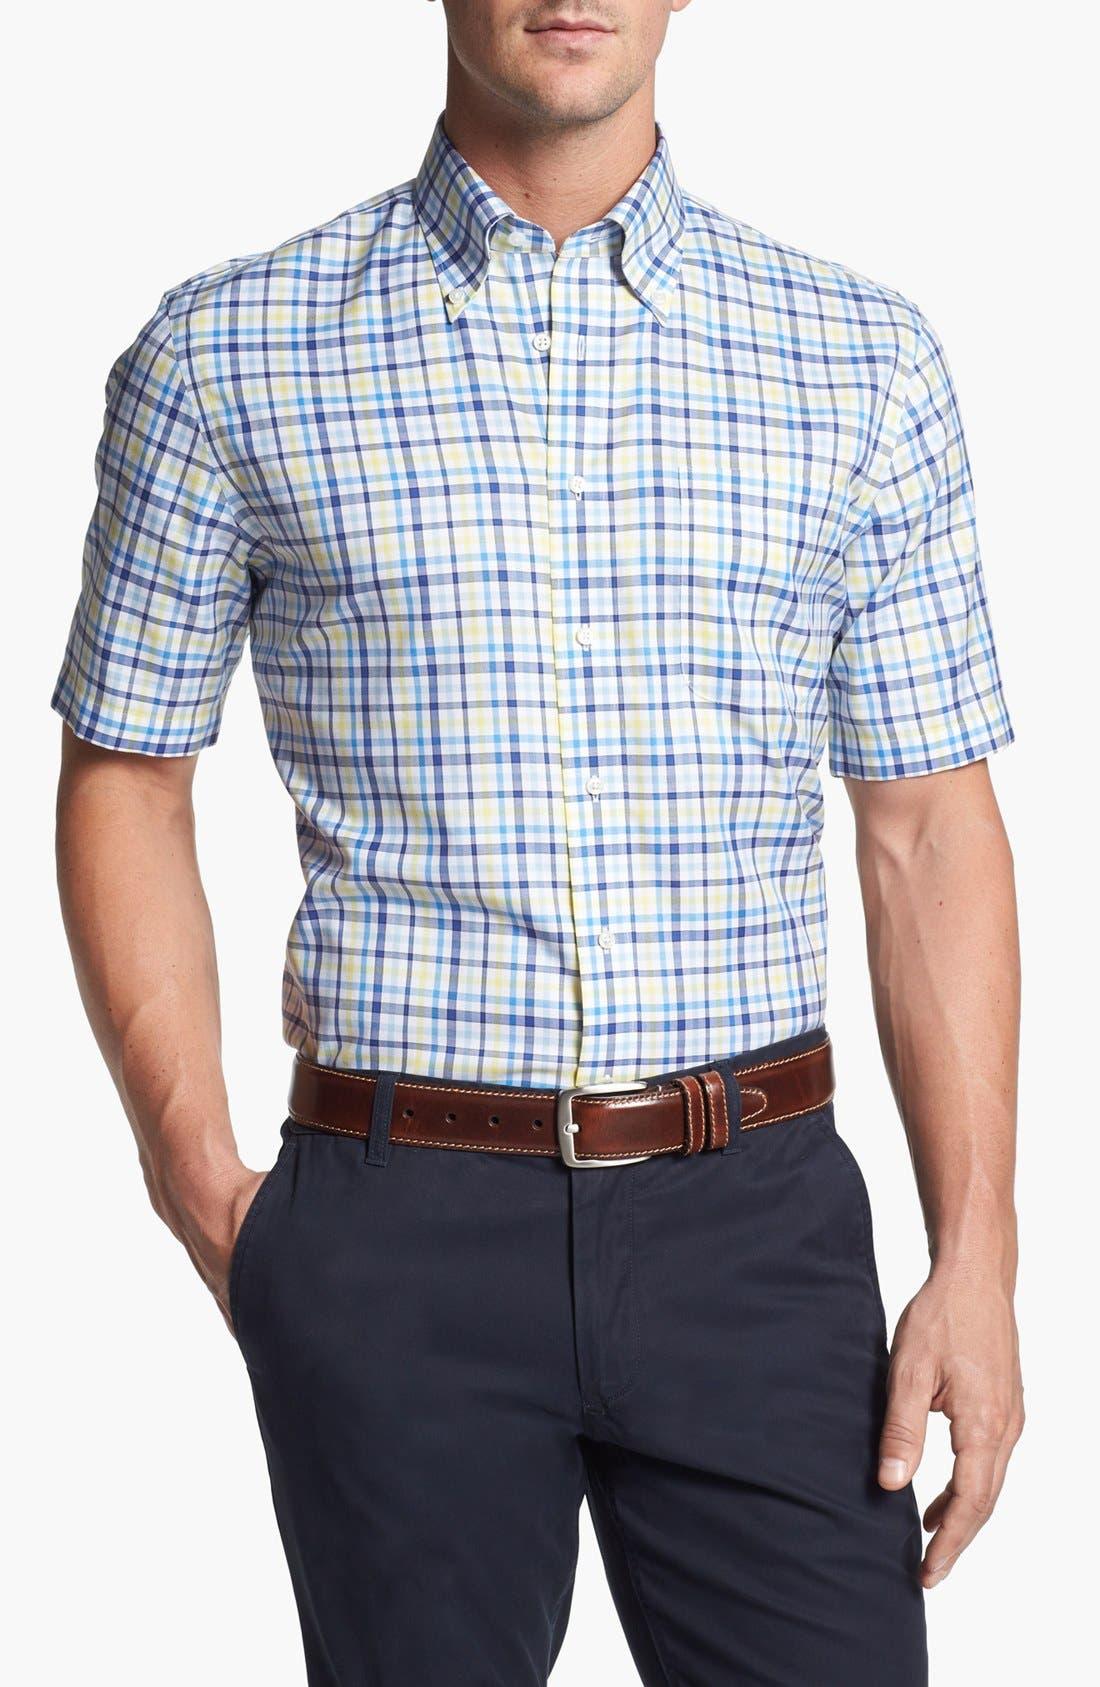 Alternate Image 1 Selected - Nordstrom Smartcare™ Traditional Fit Short Sleeve Dress Shirt